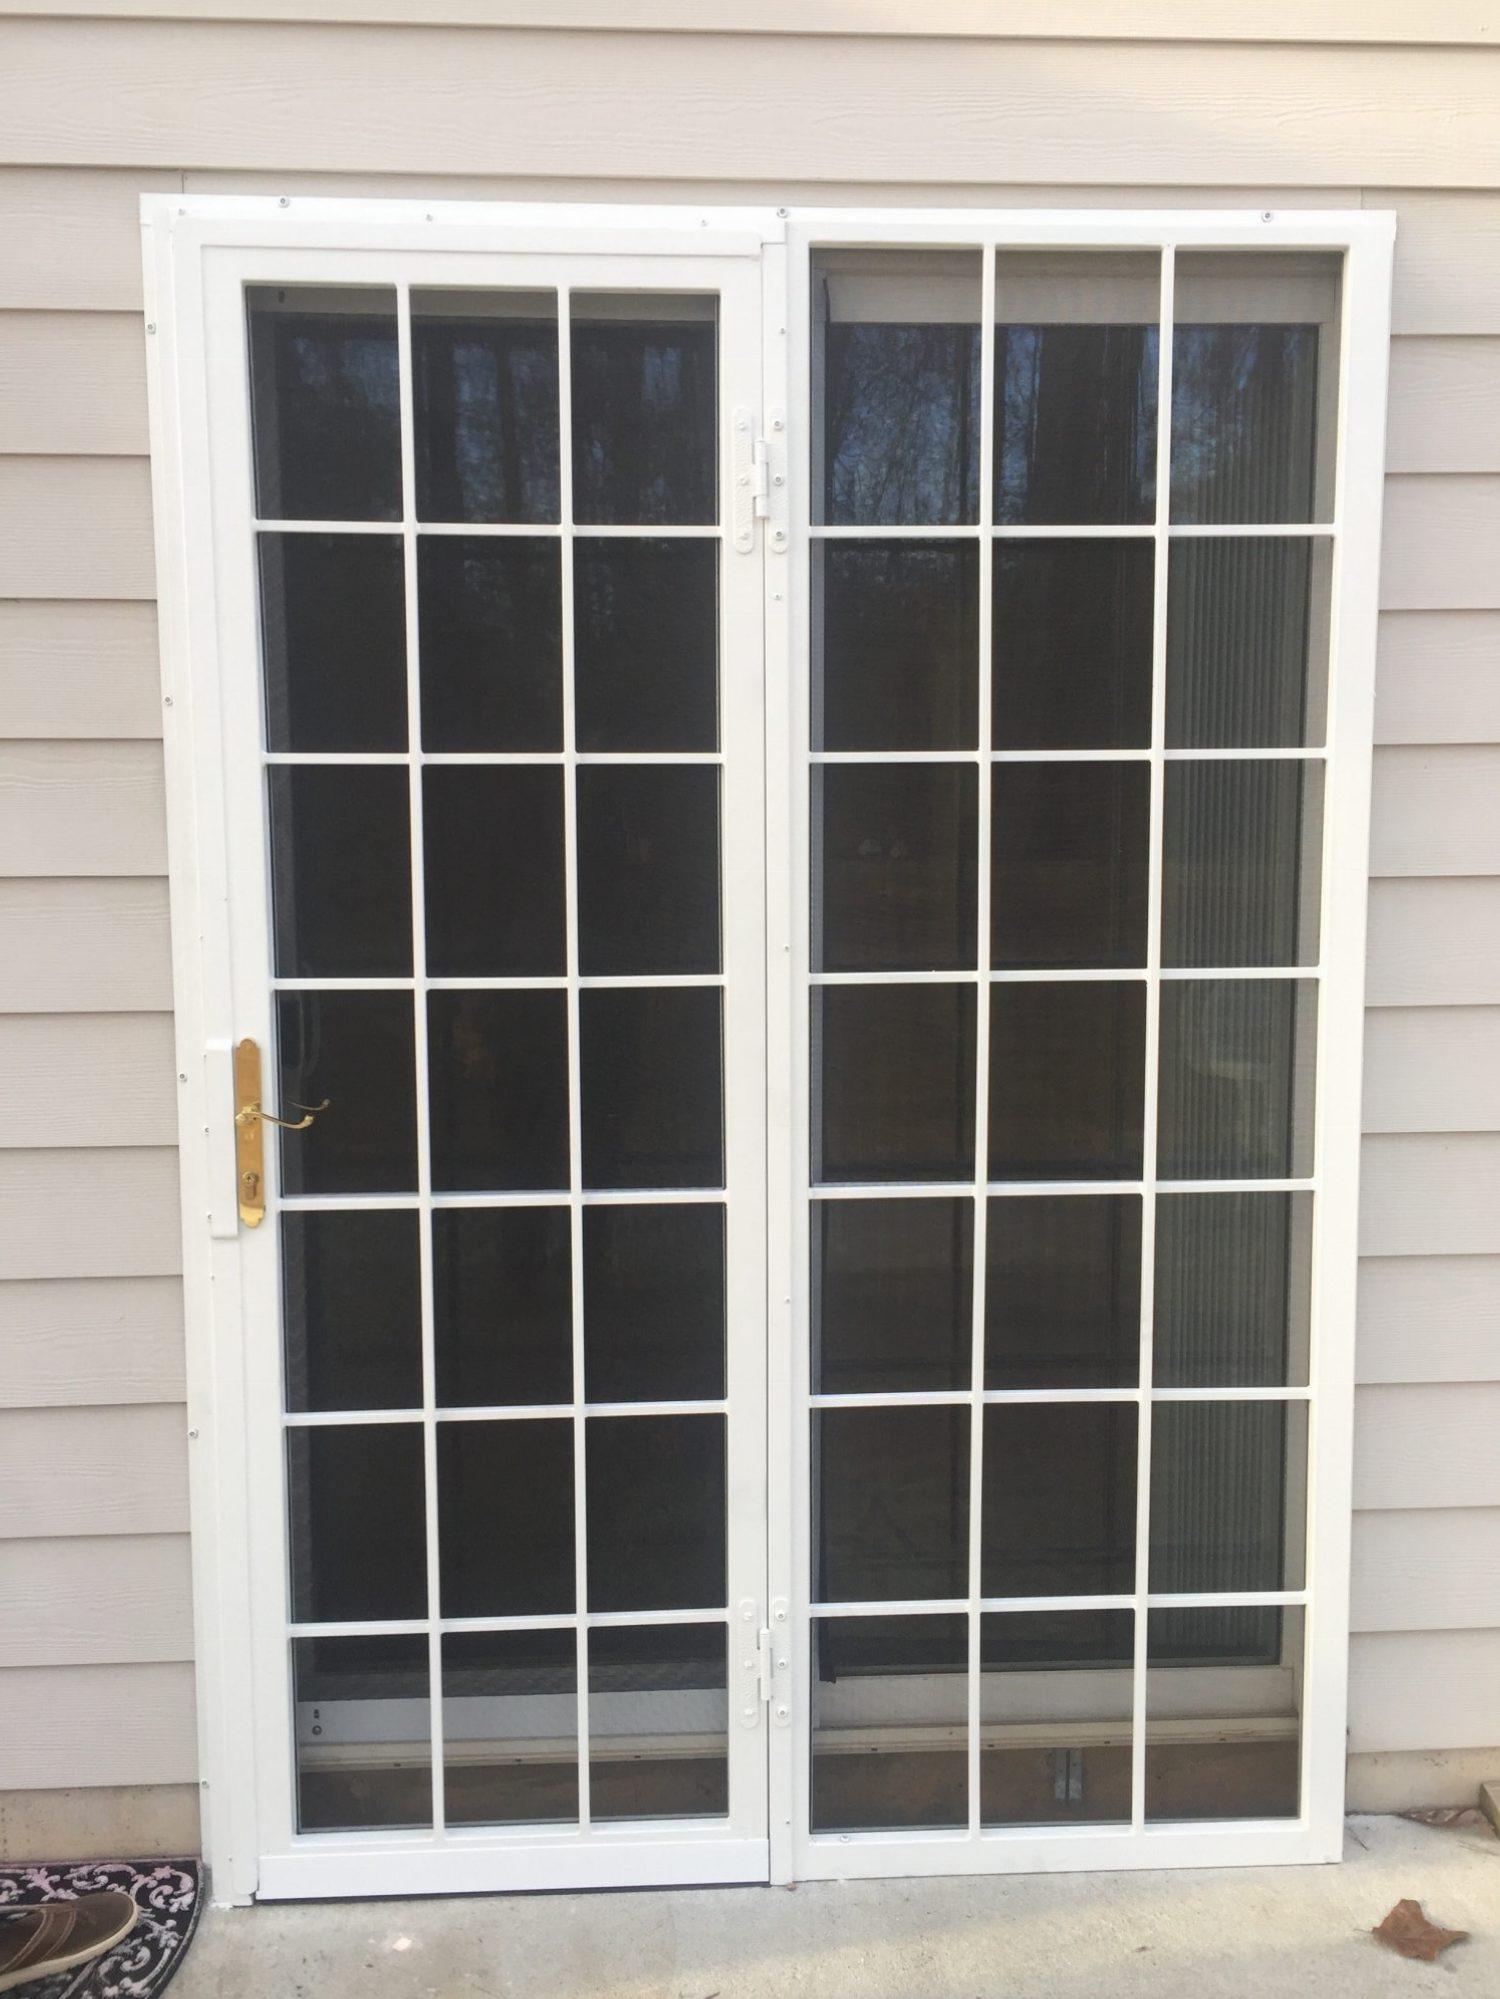 Williamsburg Patio Door With Screen 2 Ornamental Security